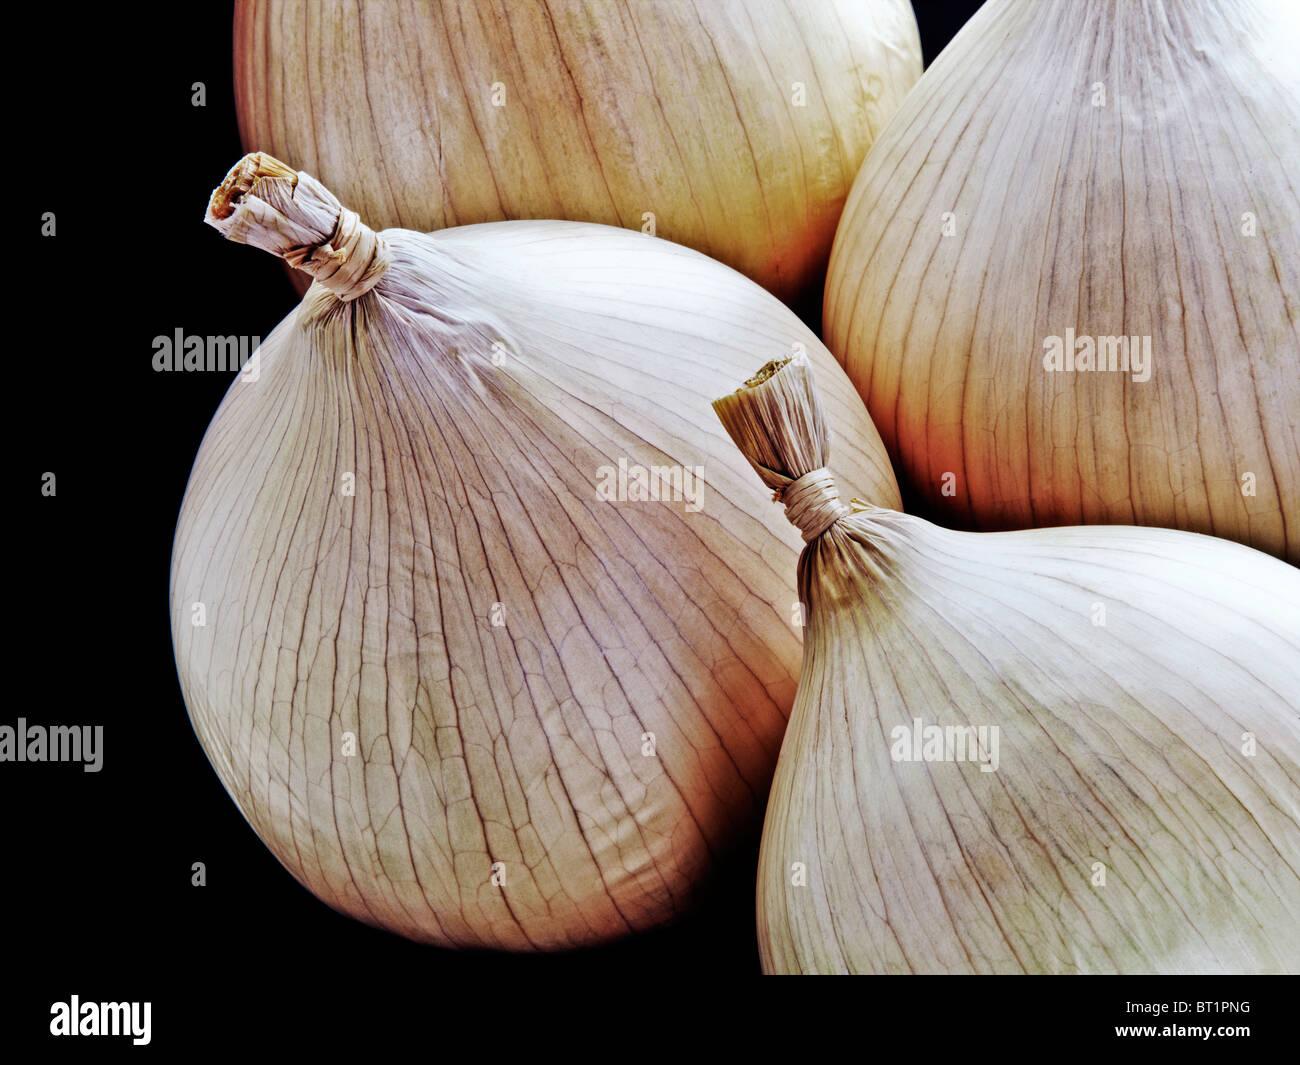 Oignons, still life Photo Stock